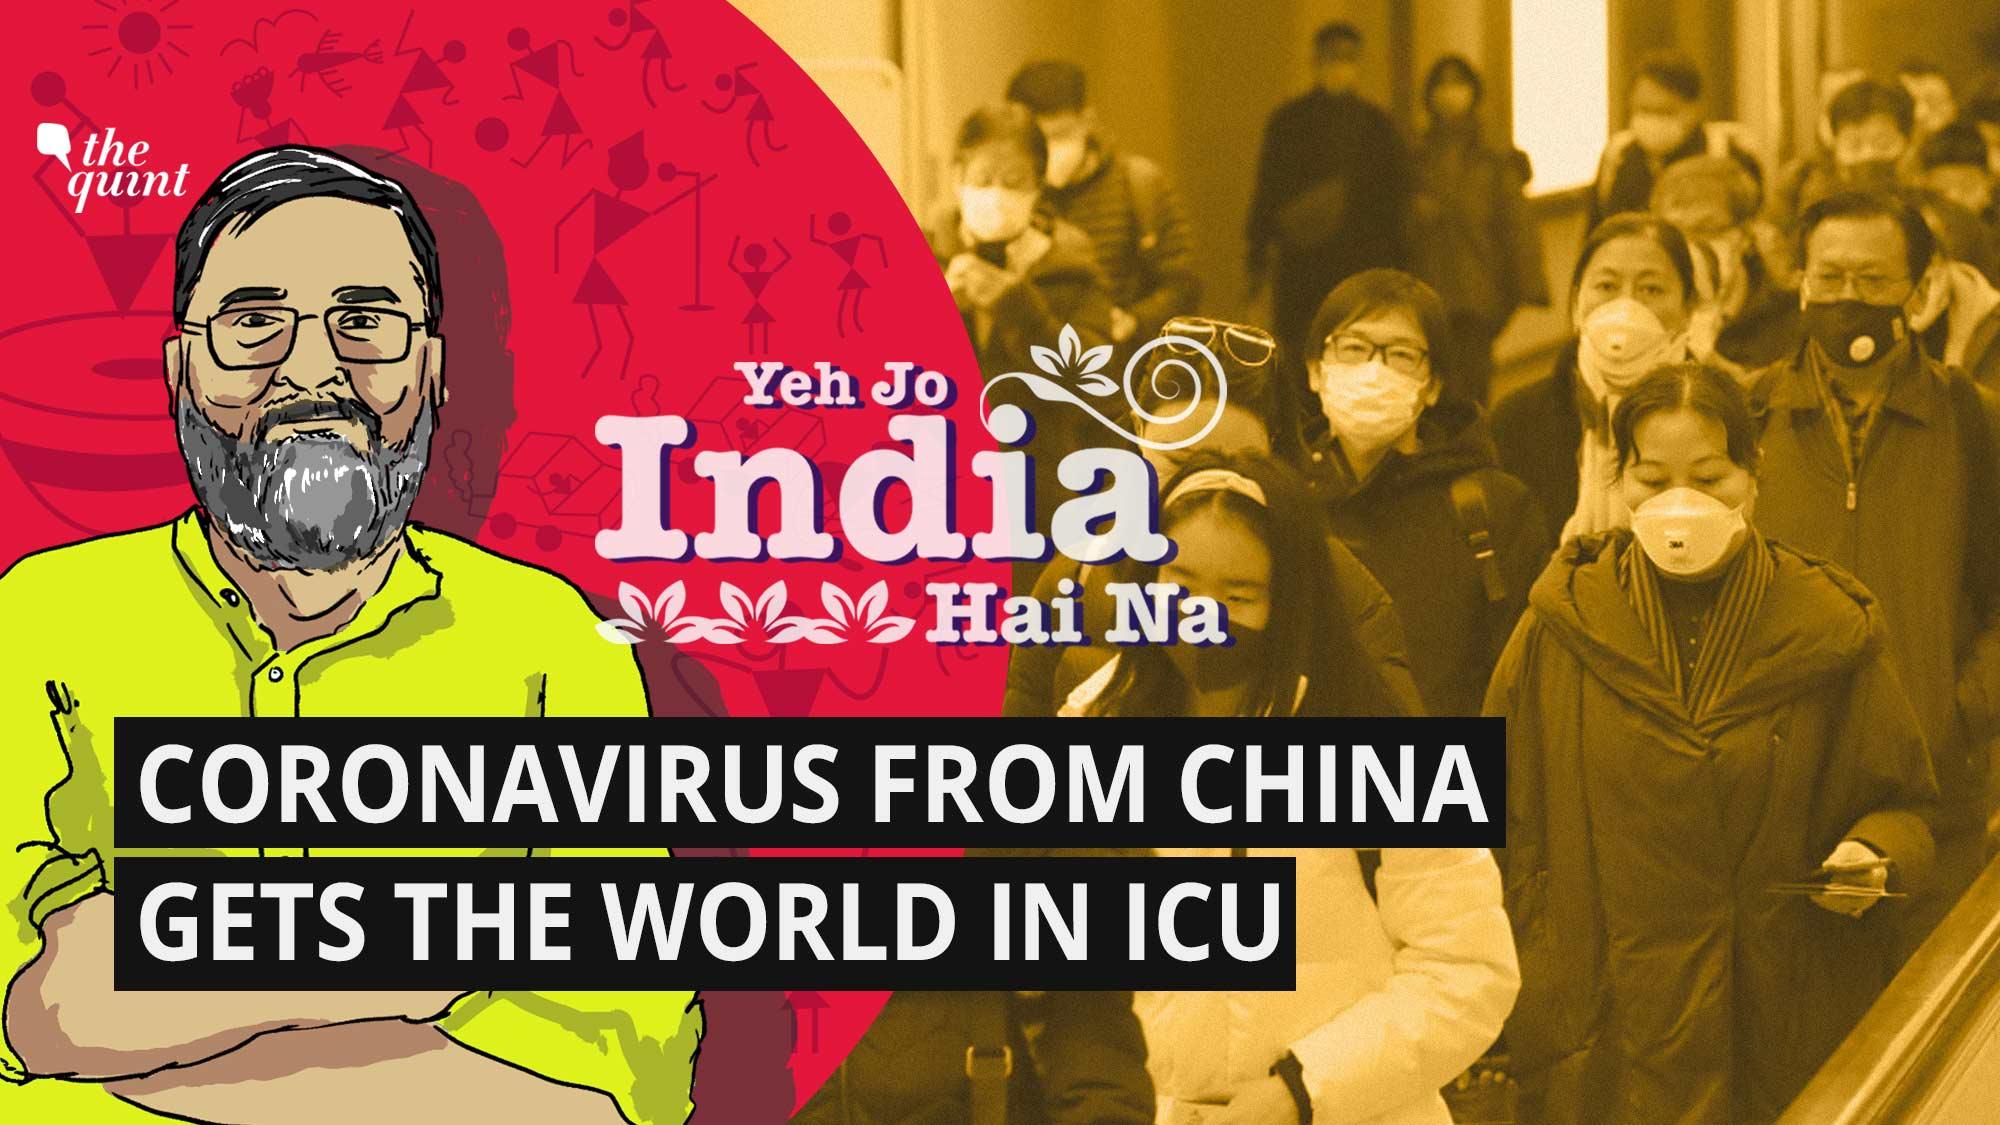 Coronavirus & Global Economic Panic: A Double Whammy From China